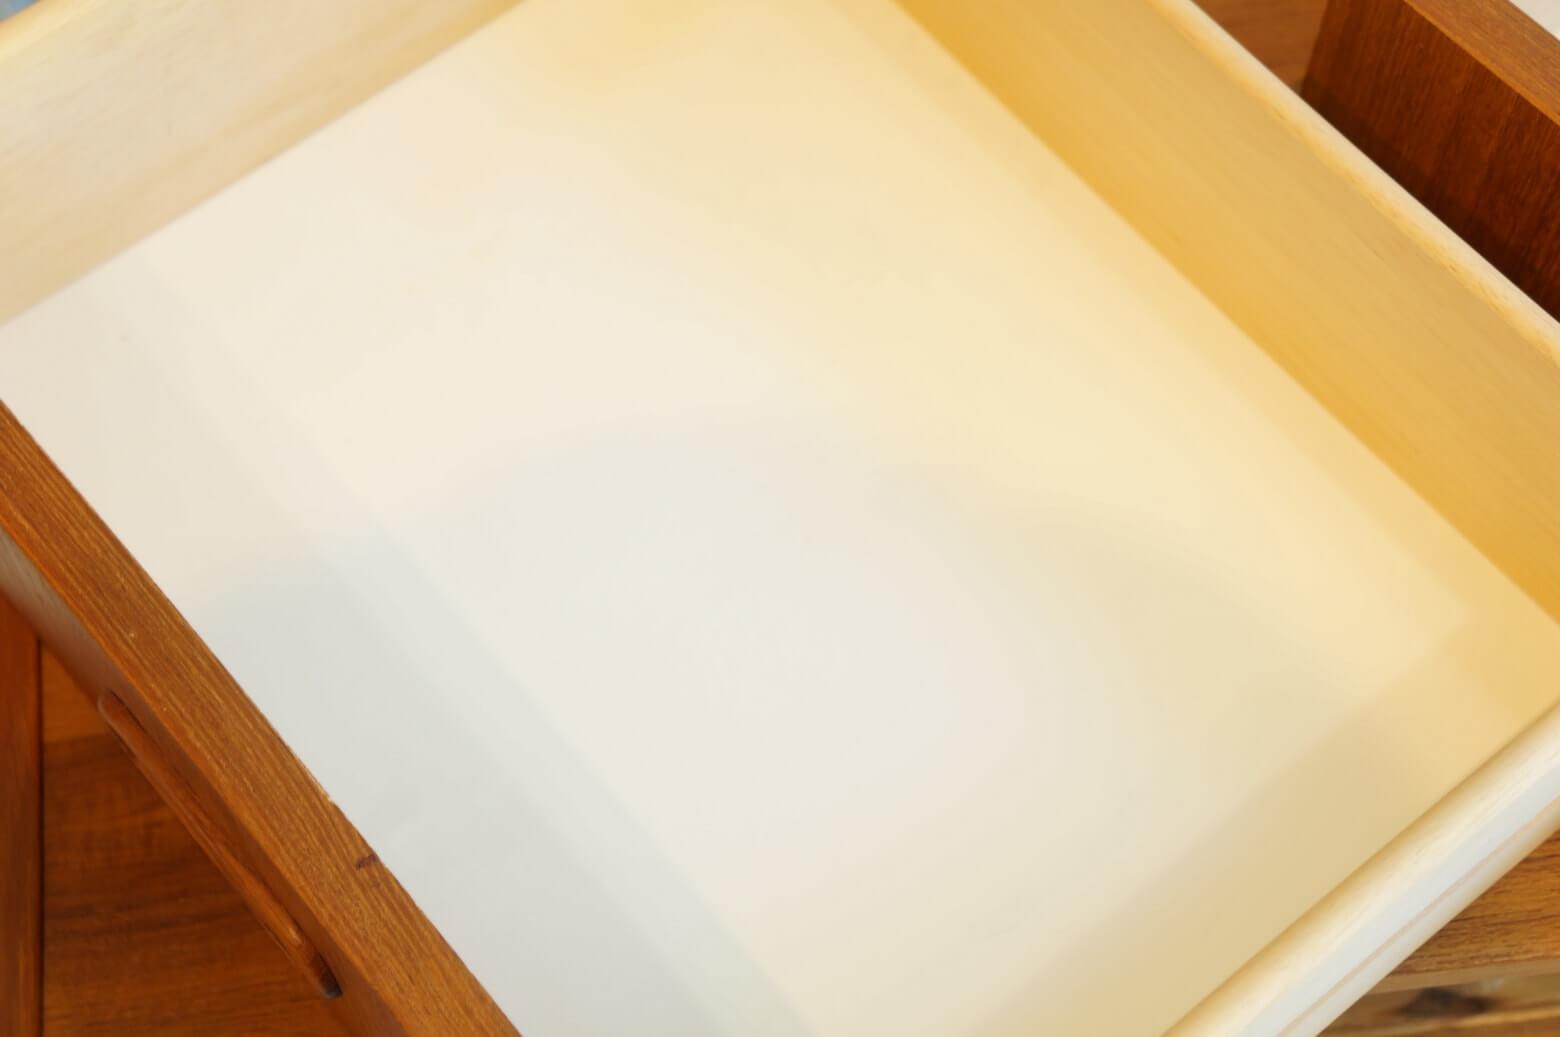 Scandinavian Vintage Small Side Board/北欧ヴィンテージ スモール サイドチェスト